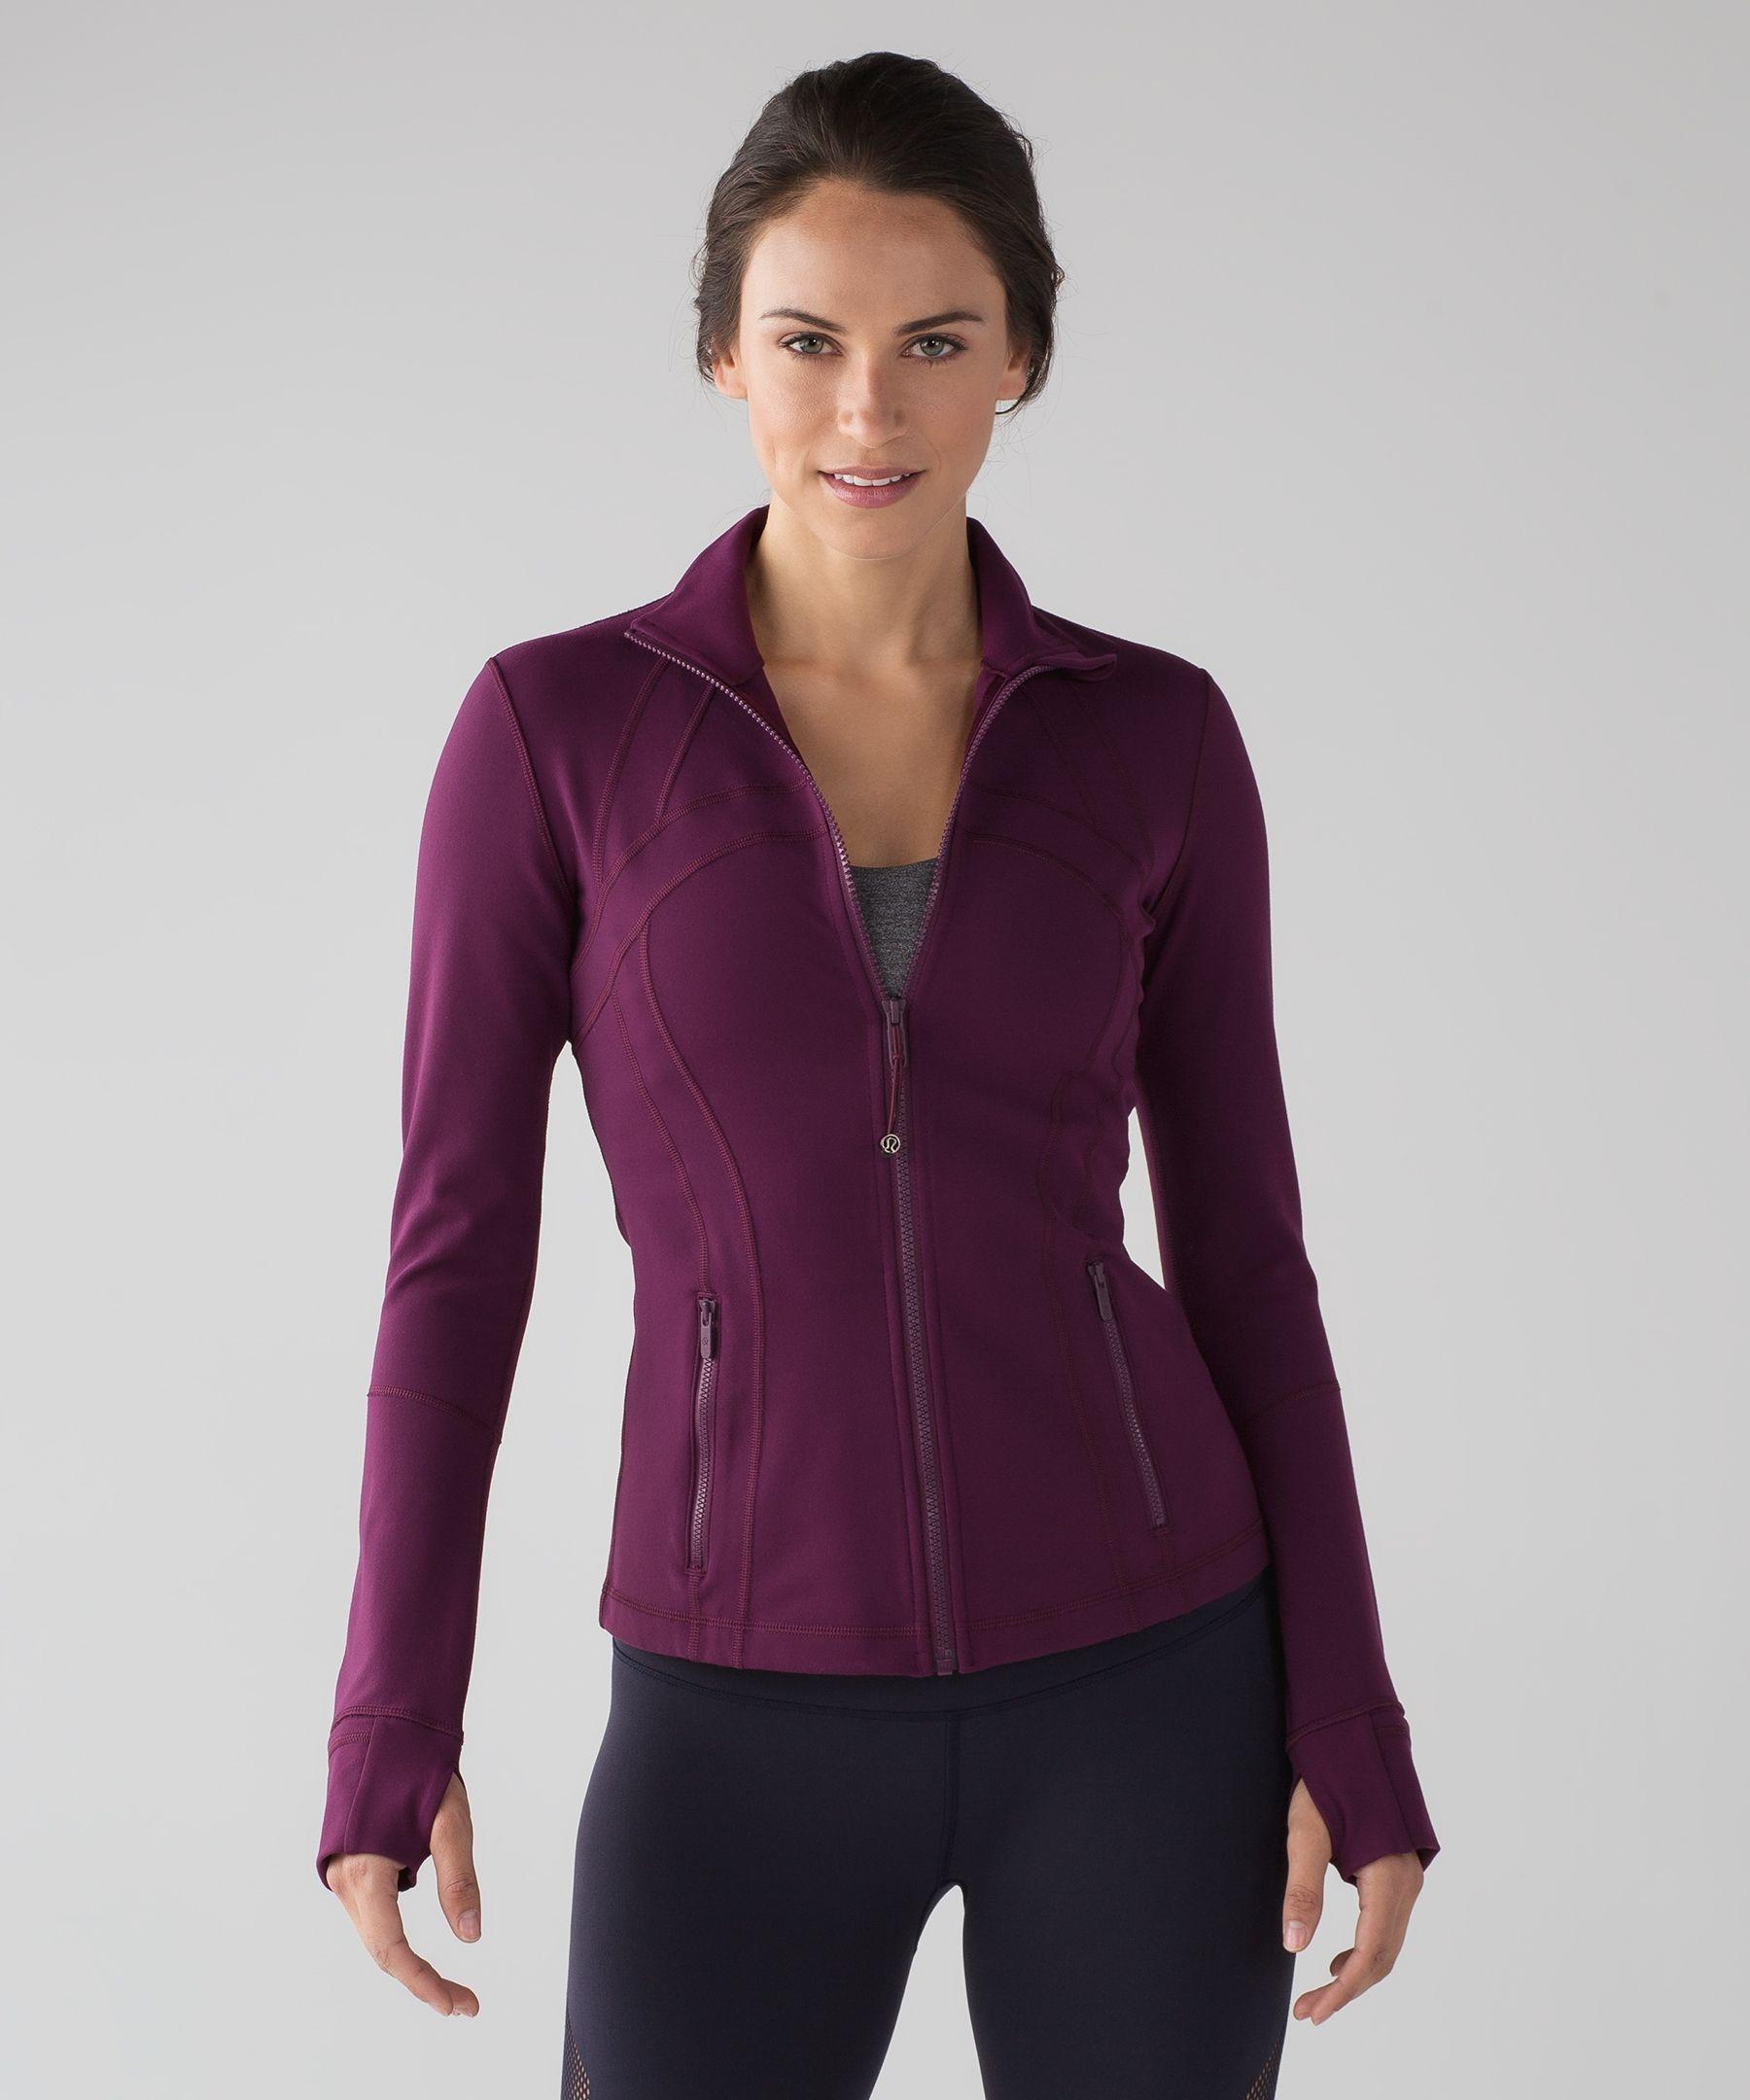 Define Jacket Women's Jackets lululemon athletica